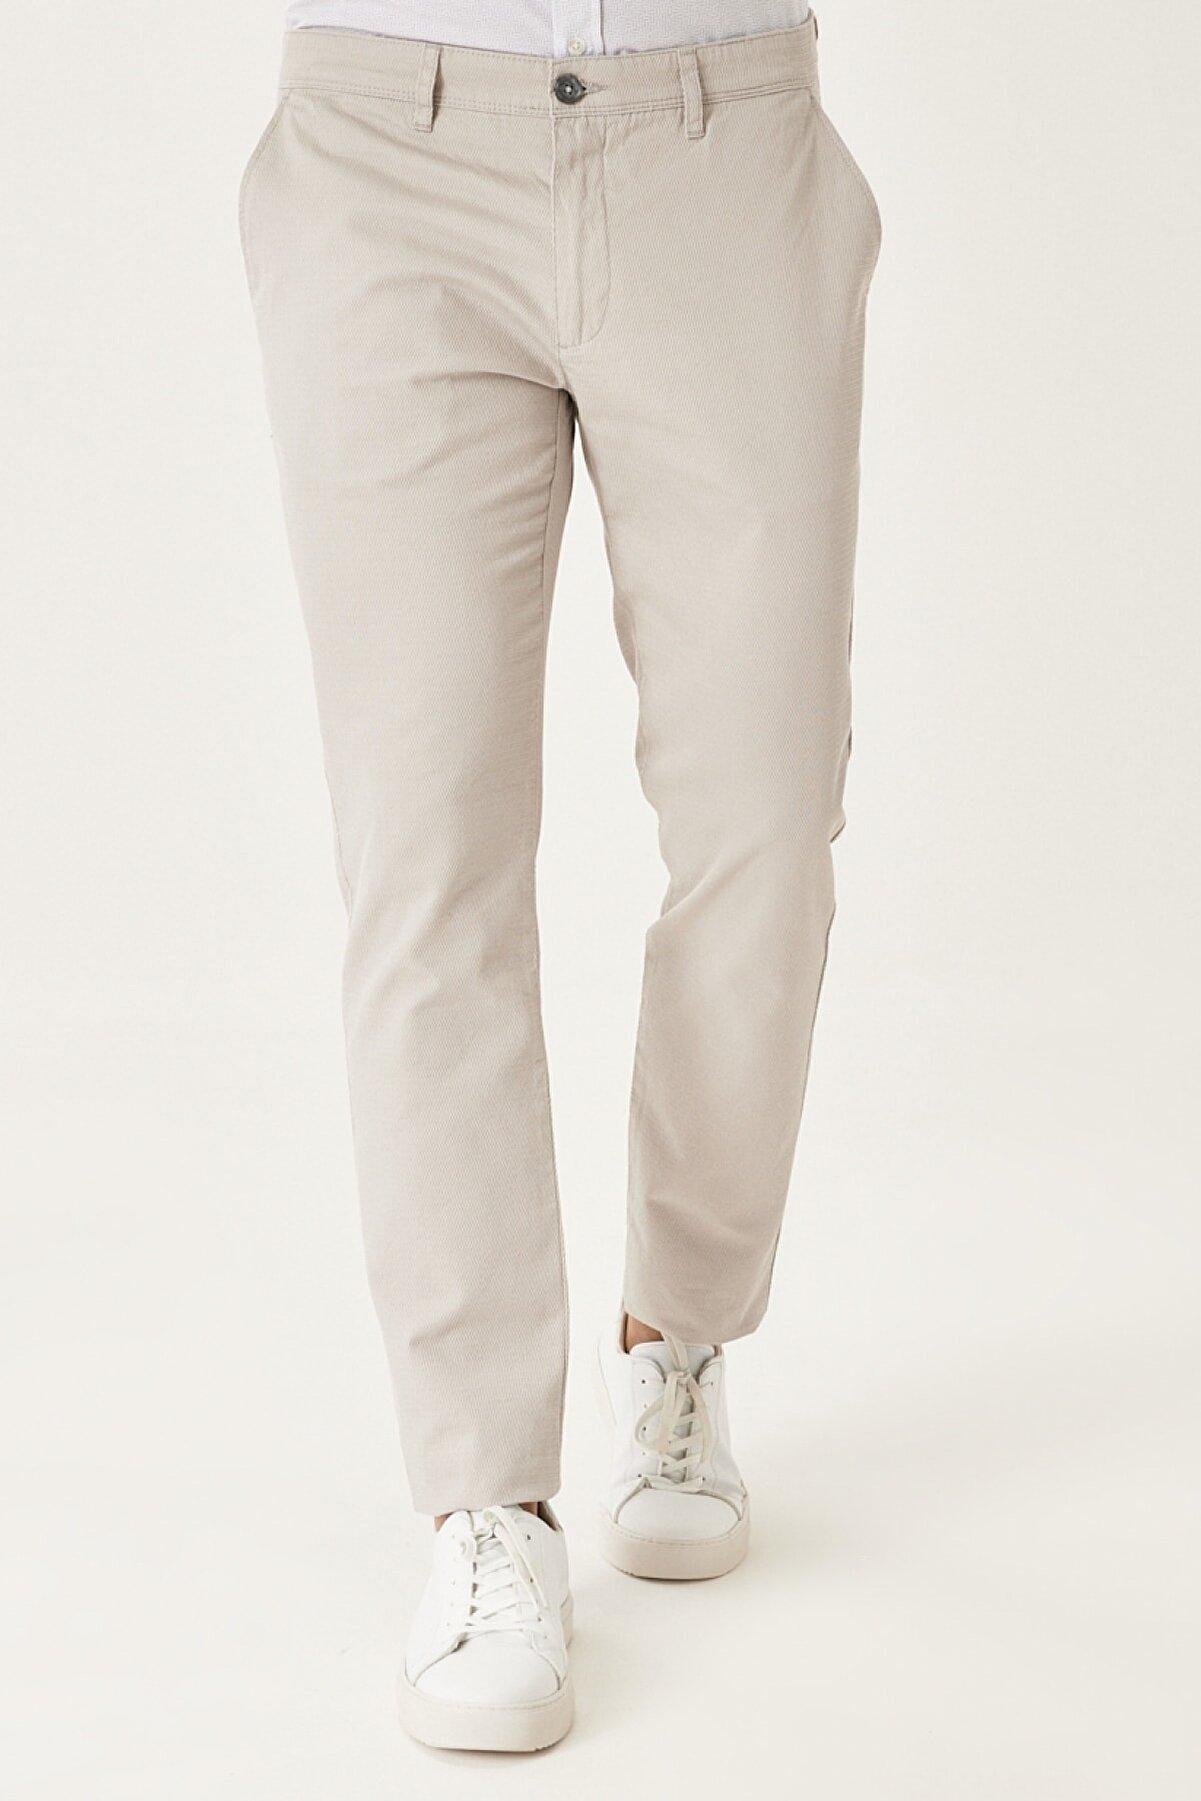 Altınyıldız Classics Erkek Taş Kanvas Slim Fit Dar Kesim Yan Cep %100 Koton Chino Pantolon